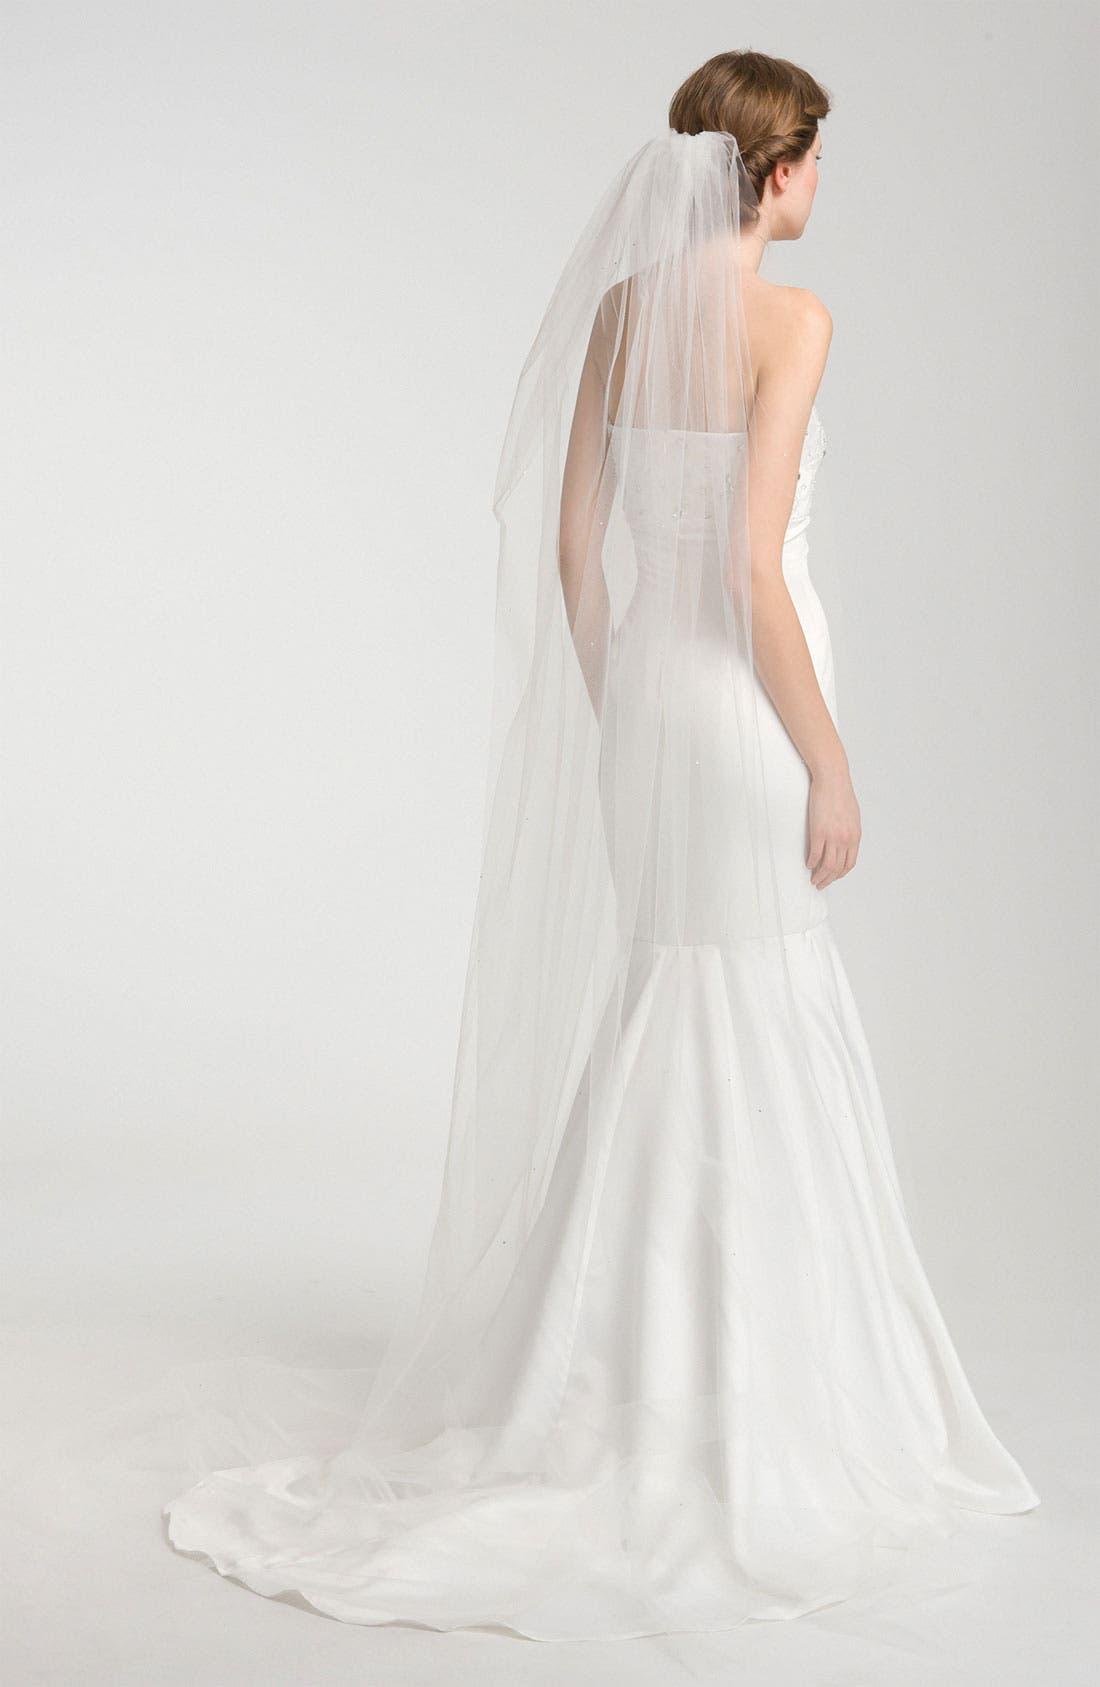 Main Image - Nina 'Demi' Single Tier Veil